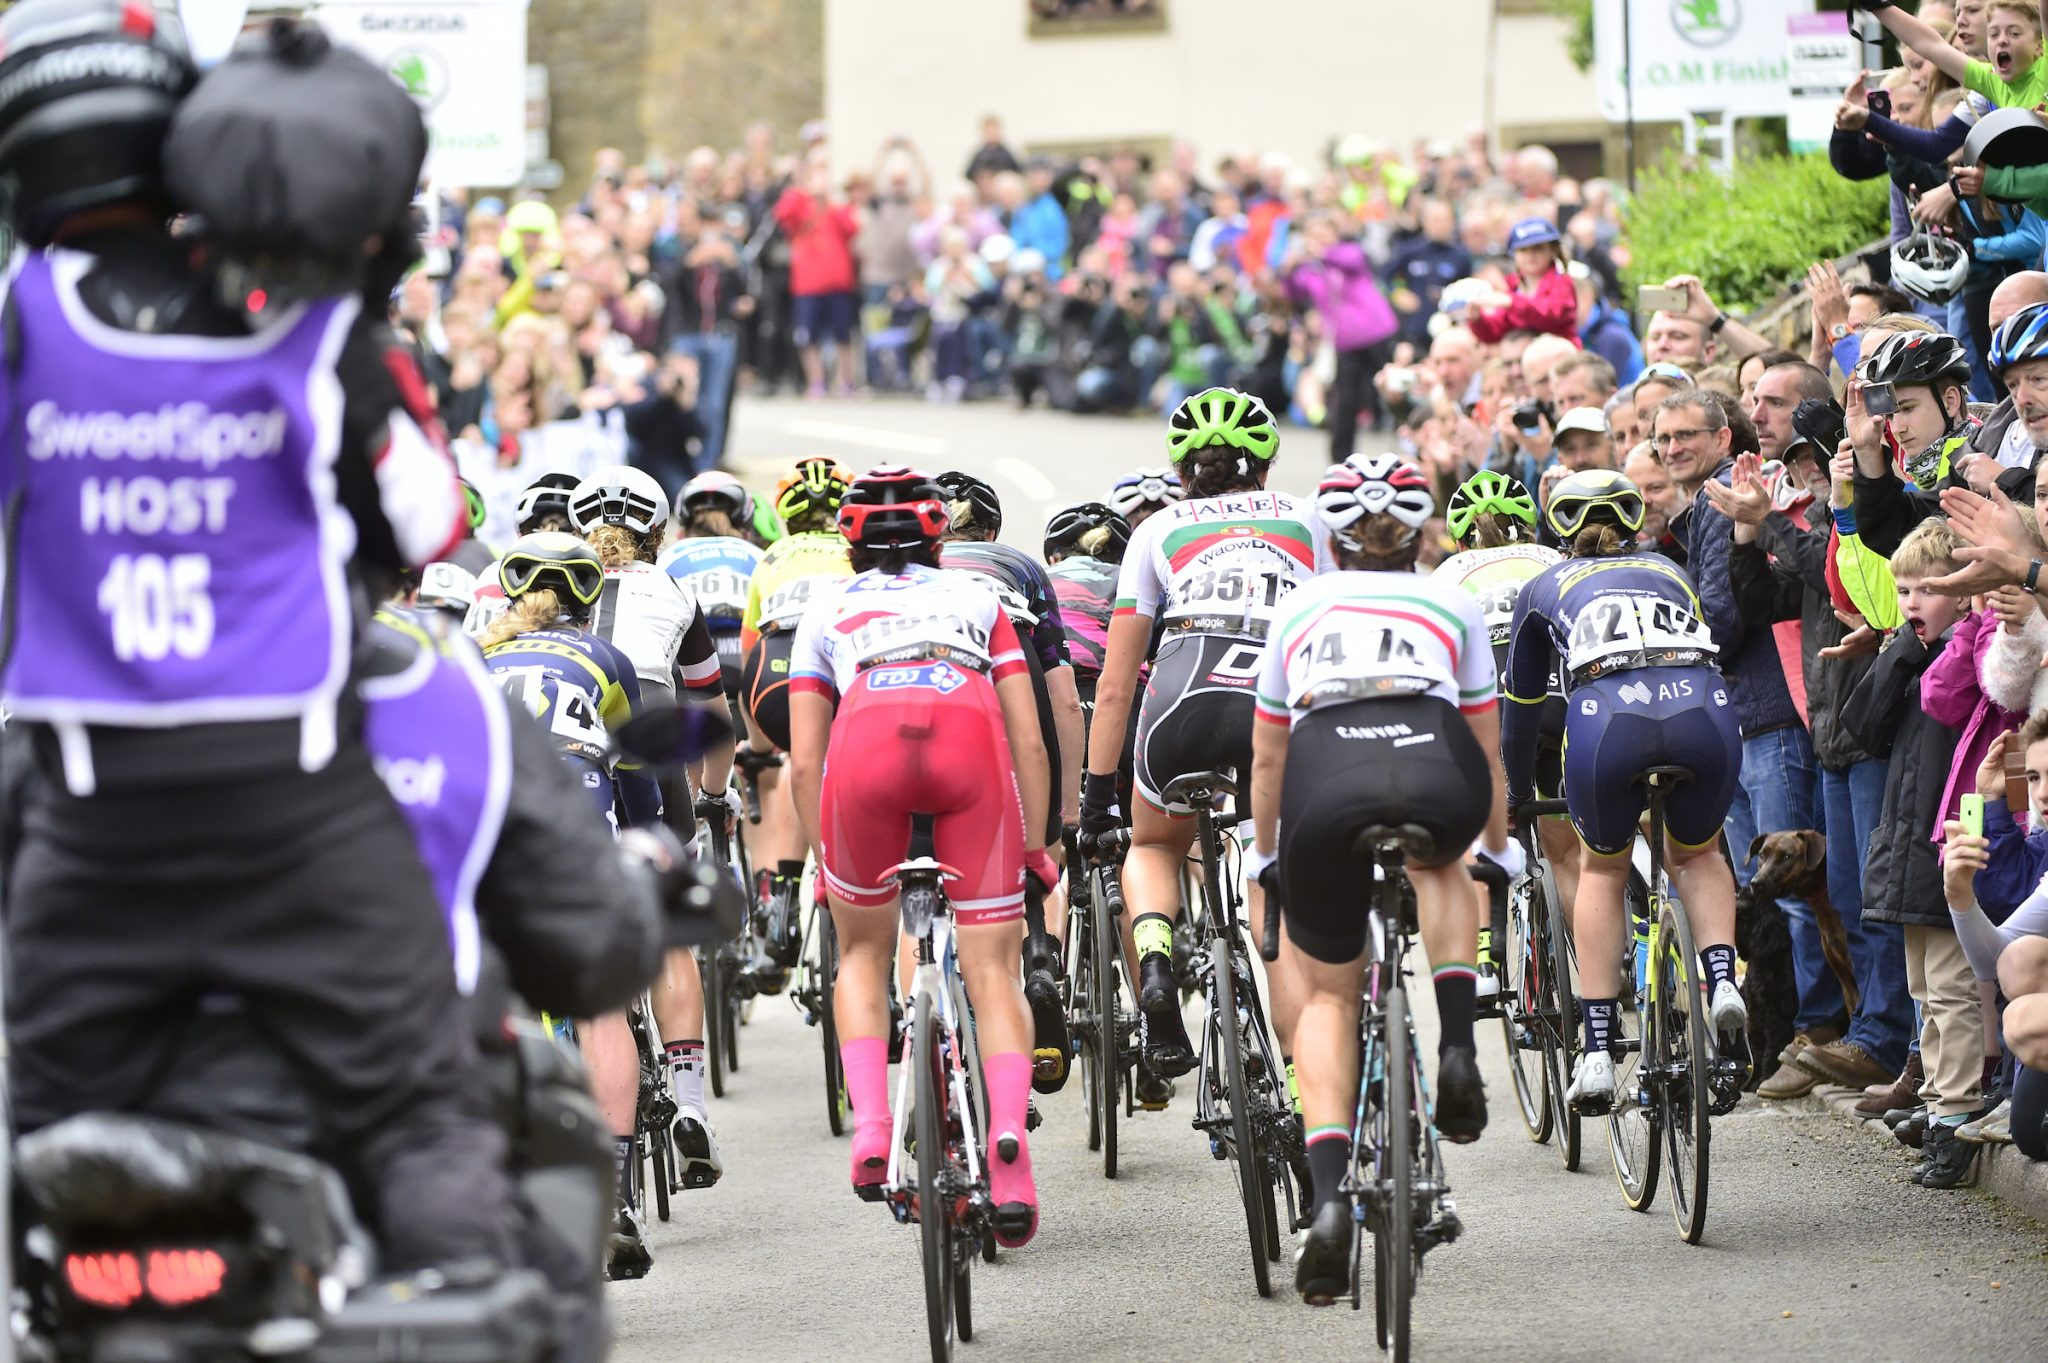 Crowds peloton Crich Derbyshire Stage 4 2017